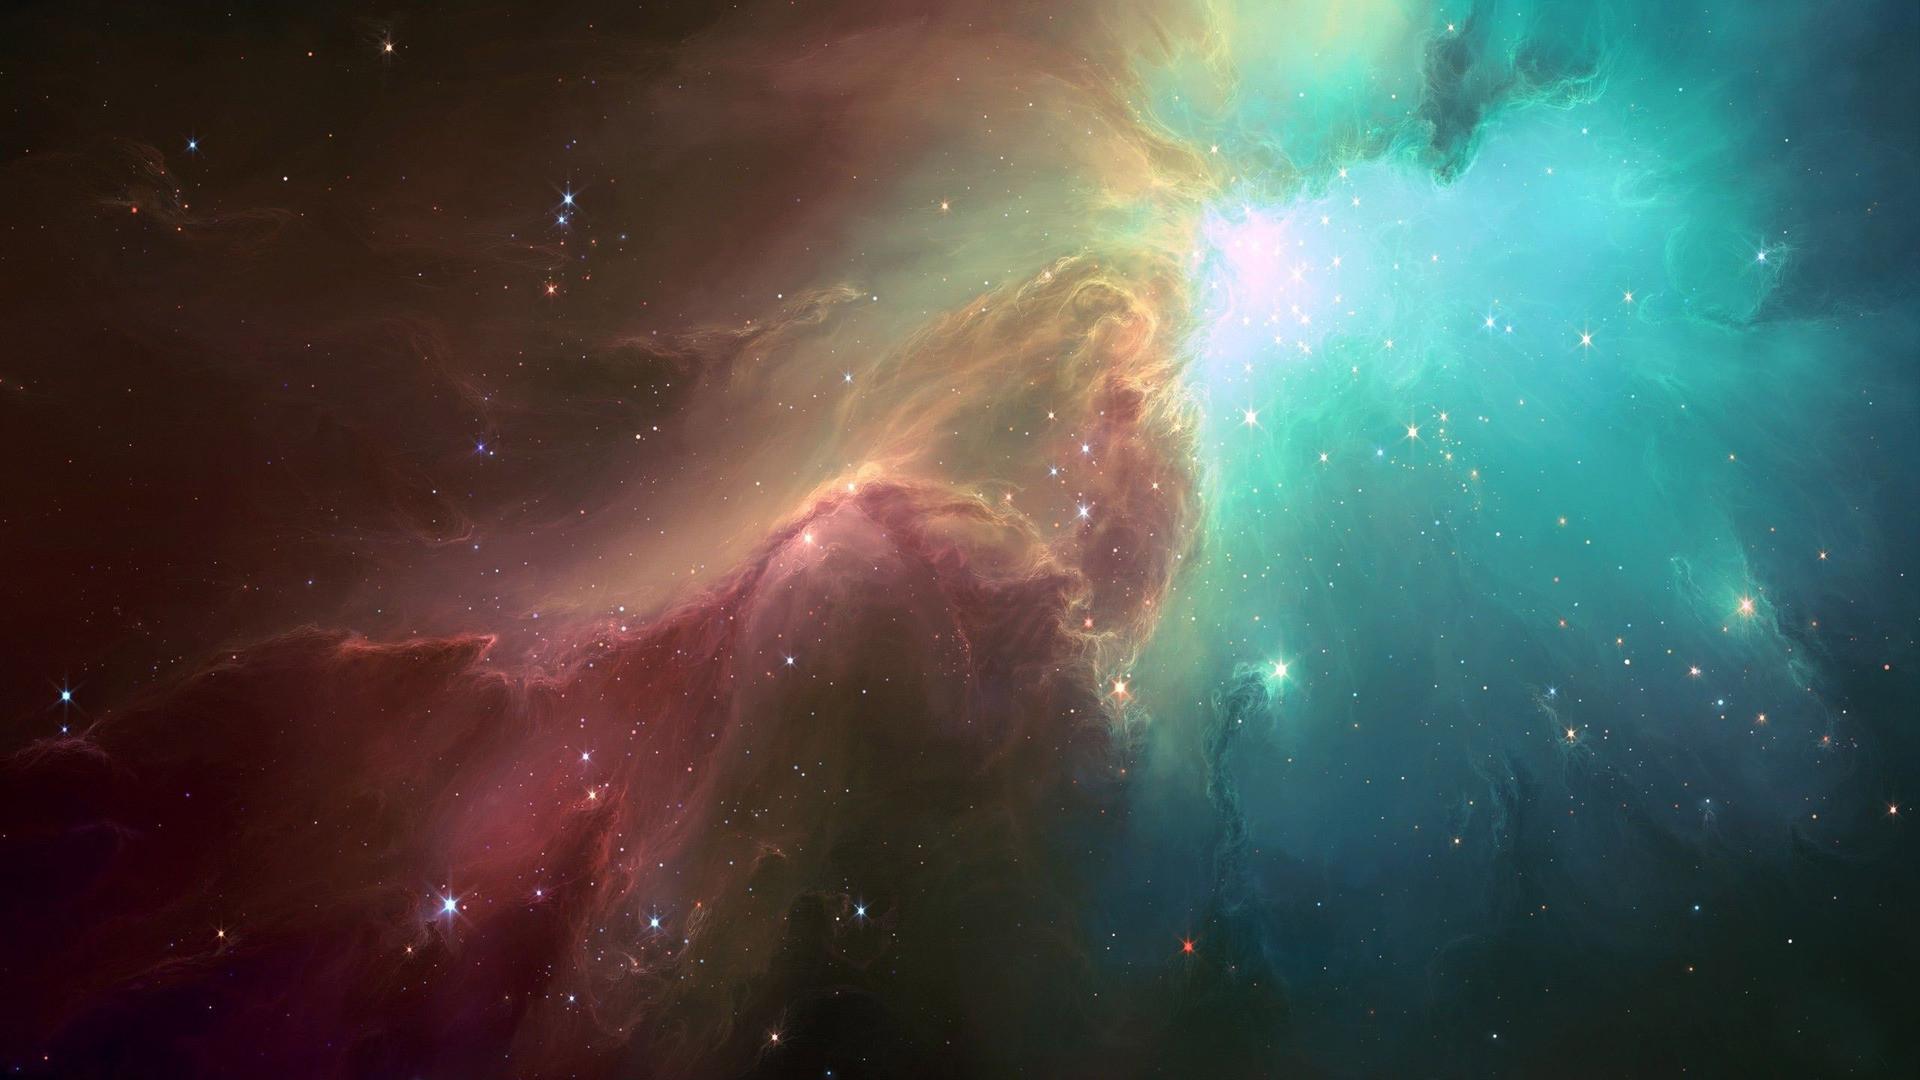 Eagle nebula wallpaper 62 images - 1080p nebula wallpaper ...